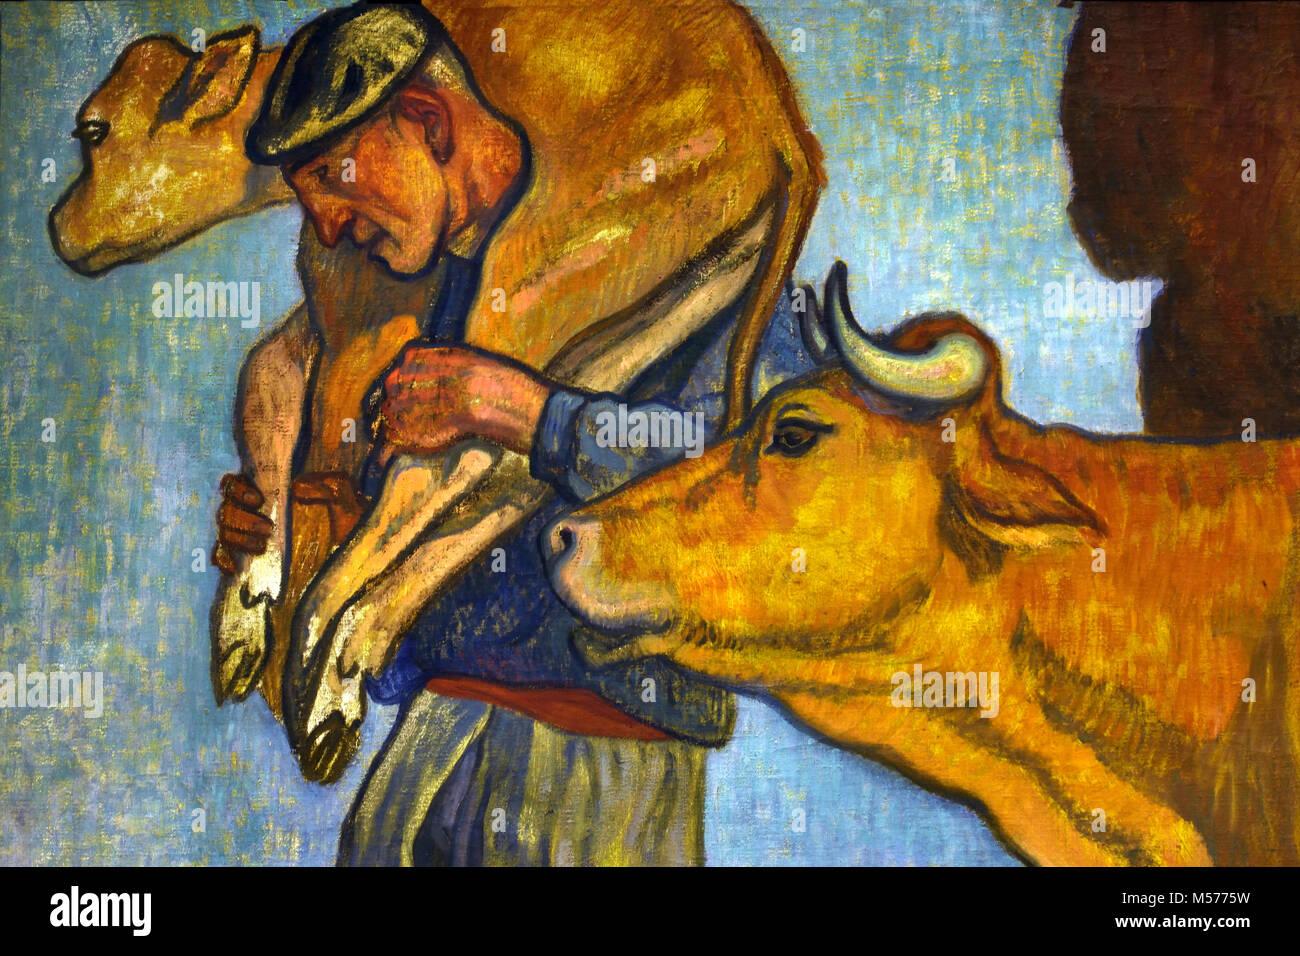 Countryman with Cow and Calf 1913 by Arteta - Aurelio, 20th, century, Spain, Spanish, Bilbao 1879 Mexico City, 1940 - Stock Image